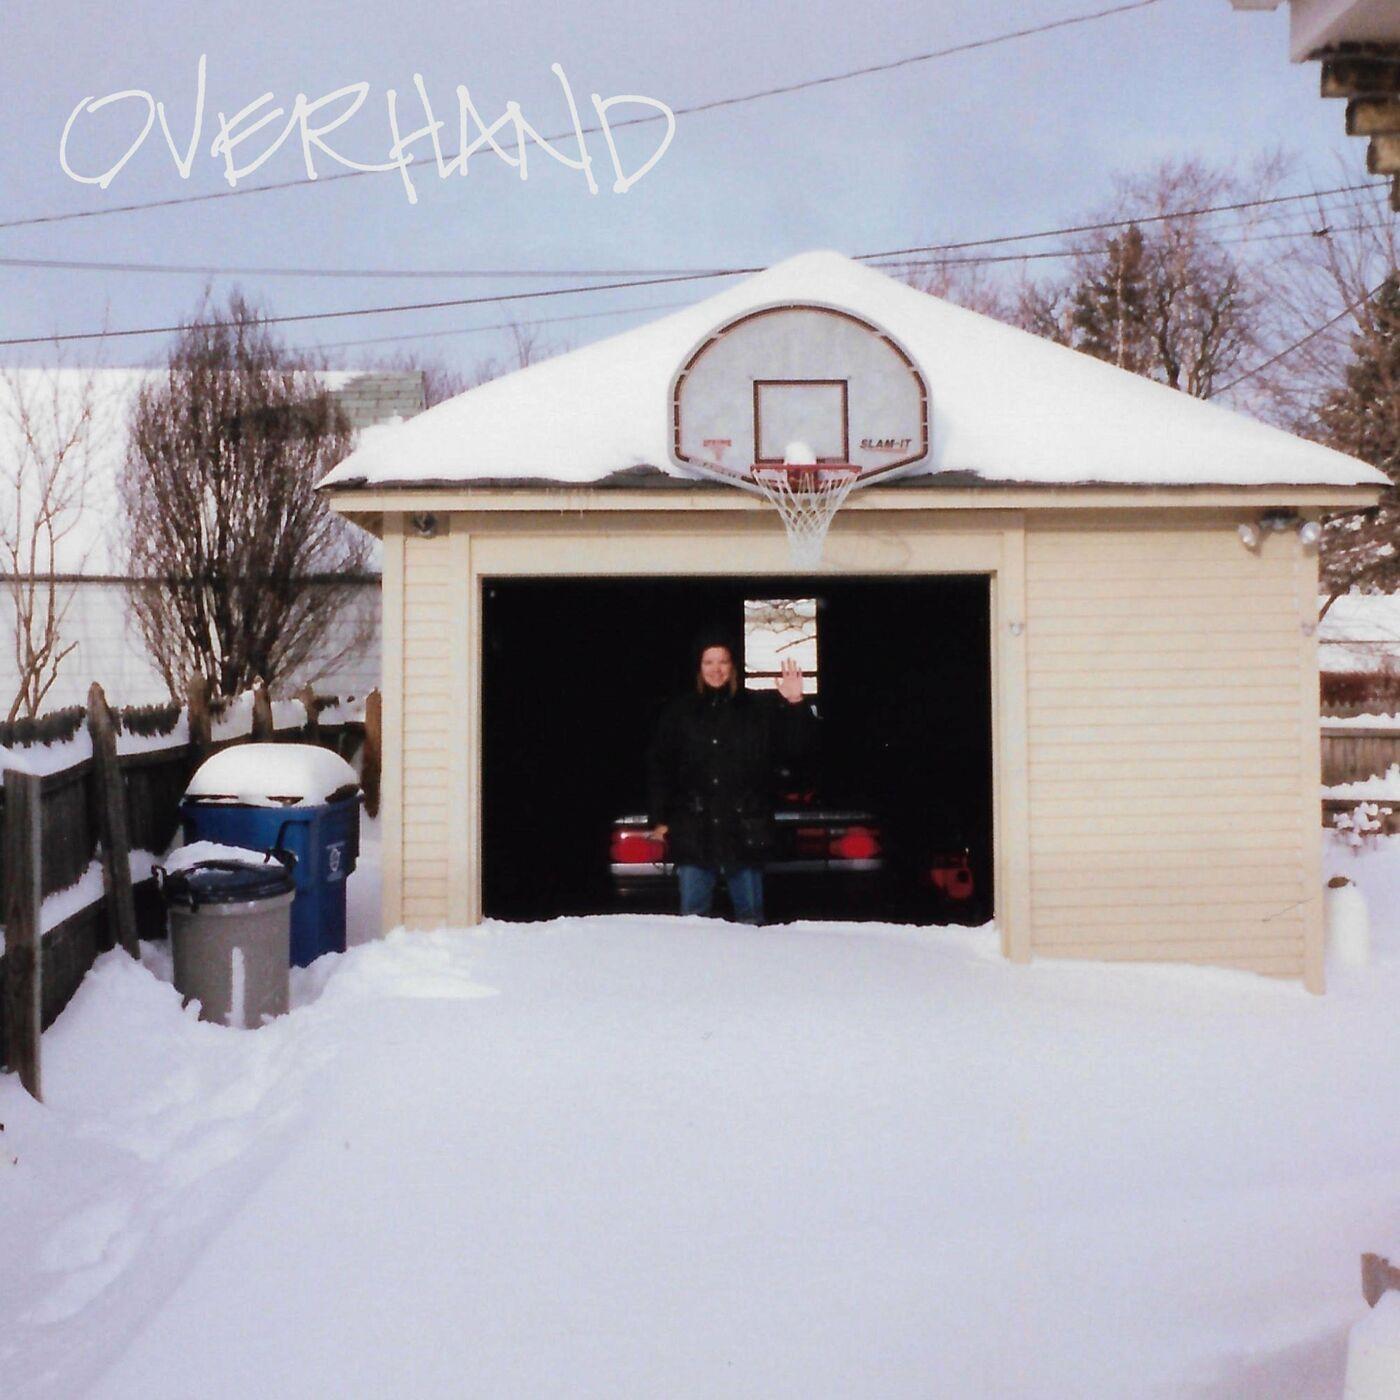 Overhand - Plaster Saint (2021)